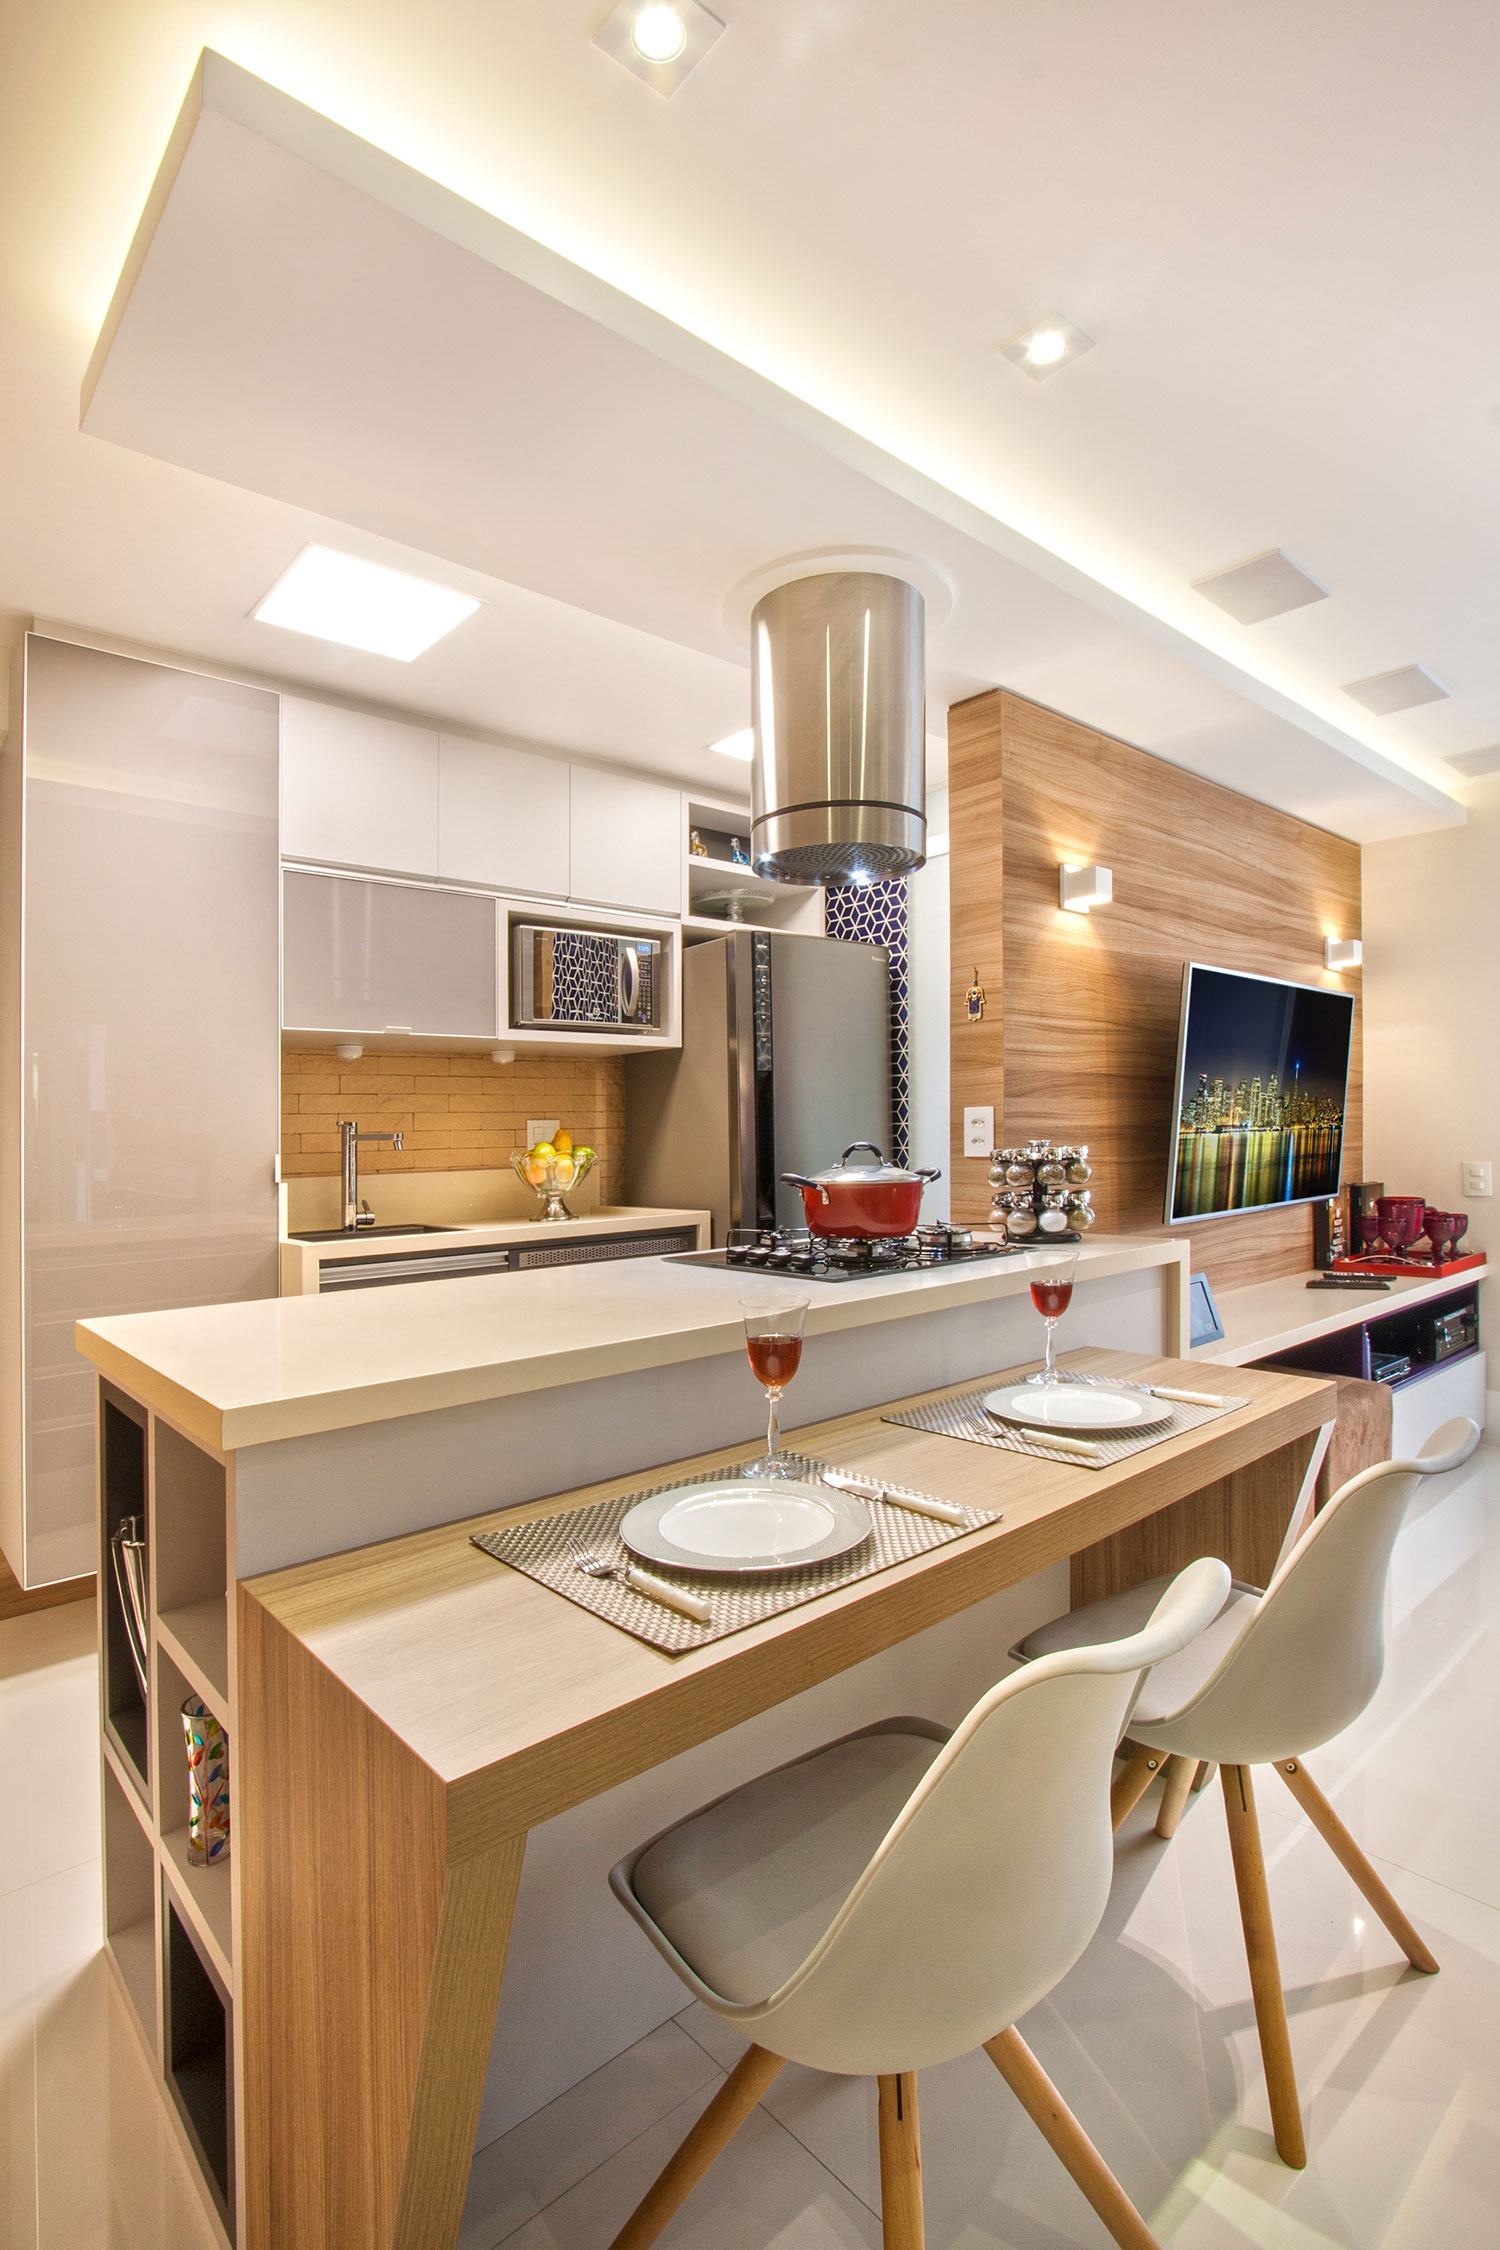 Cozinha clean 60 modelos e projetos incr veis - Bancadas de cocina ...